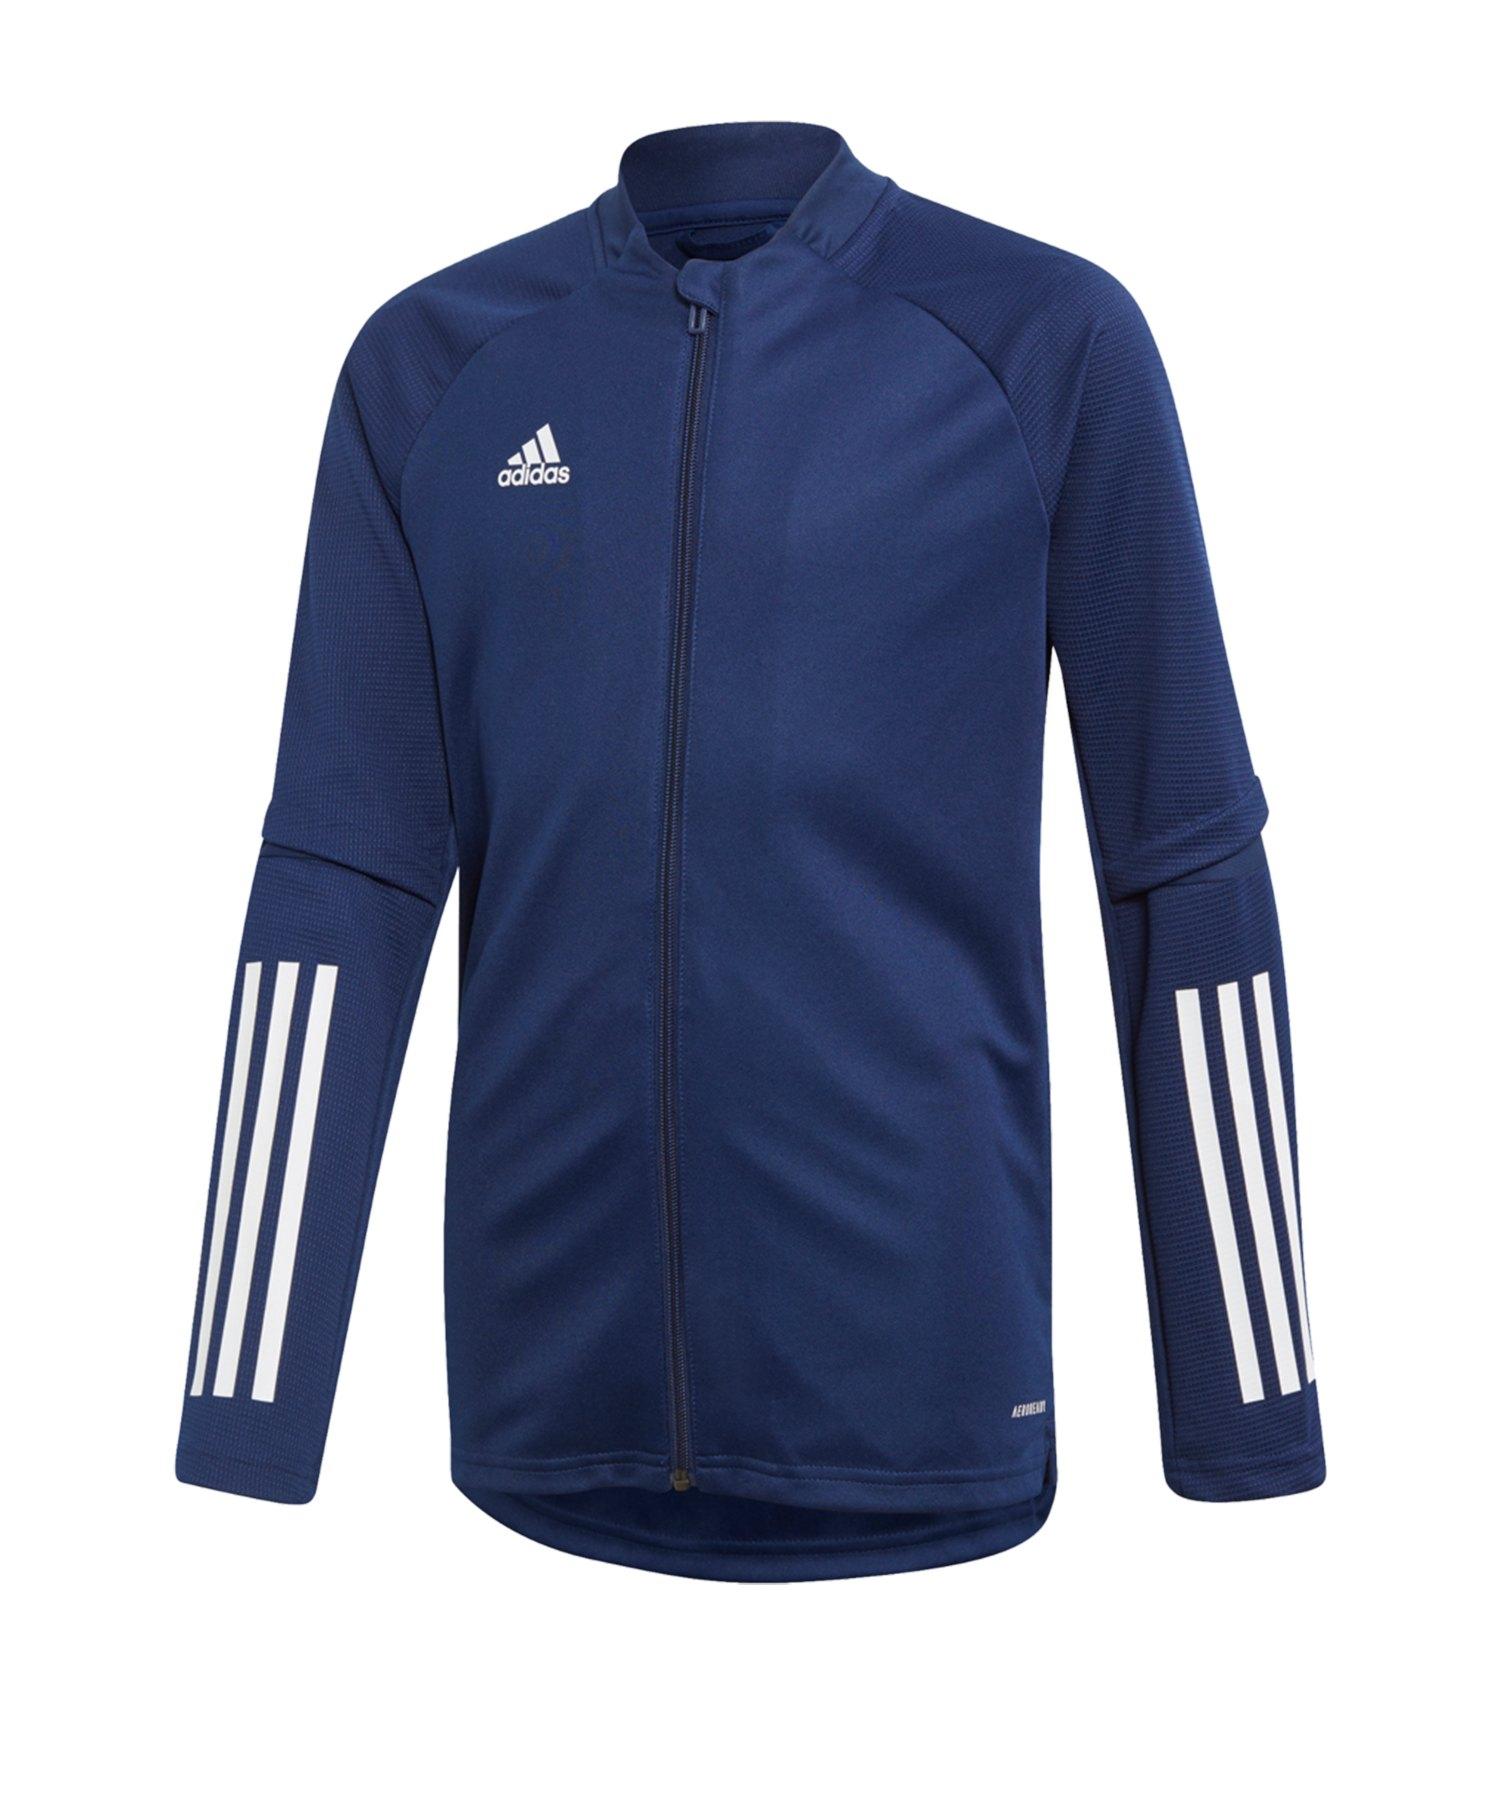 adidas Condivo 20 Trainingsjacke Kids Blau Weiss - blau